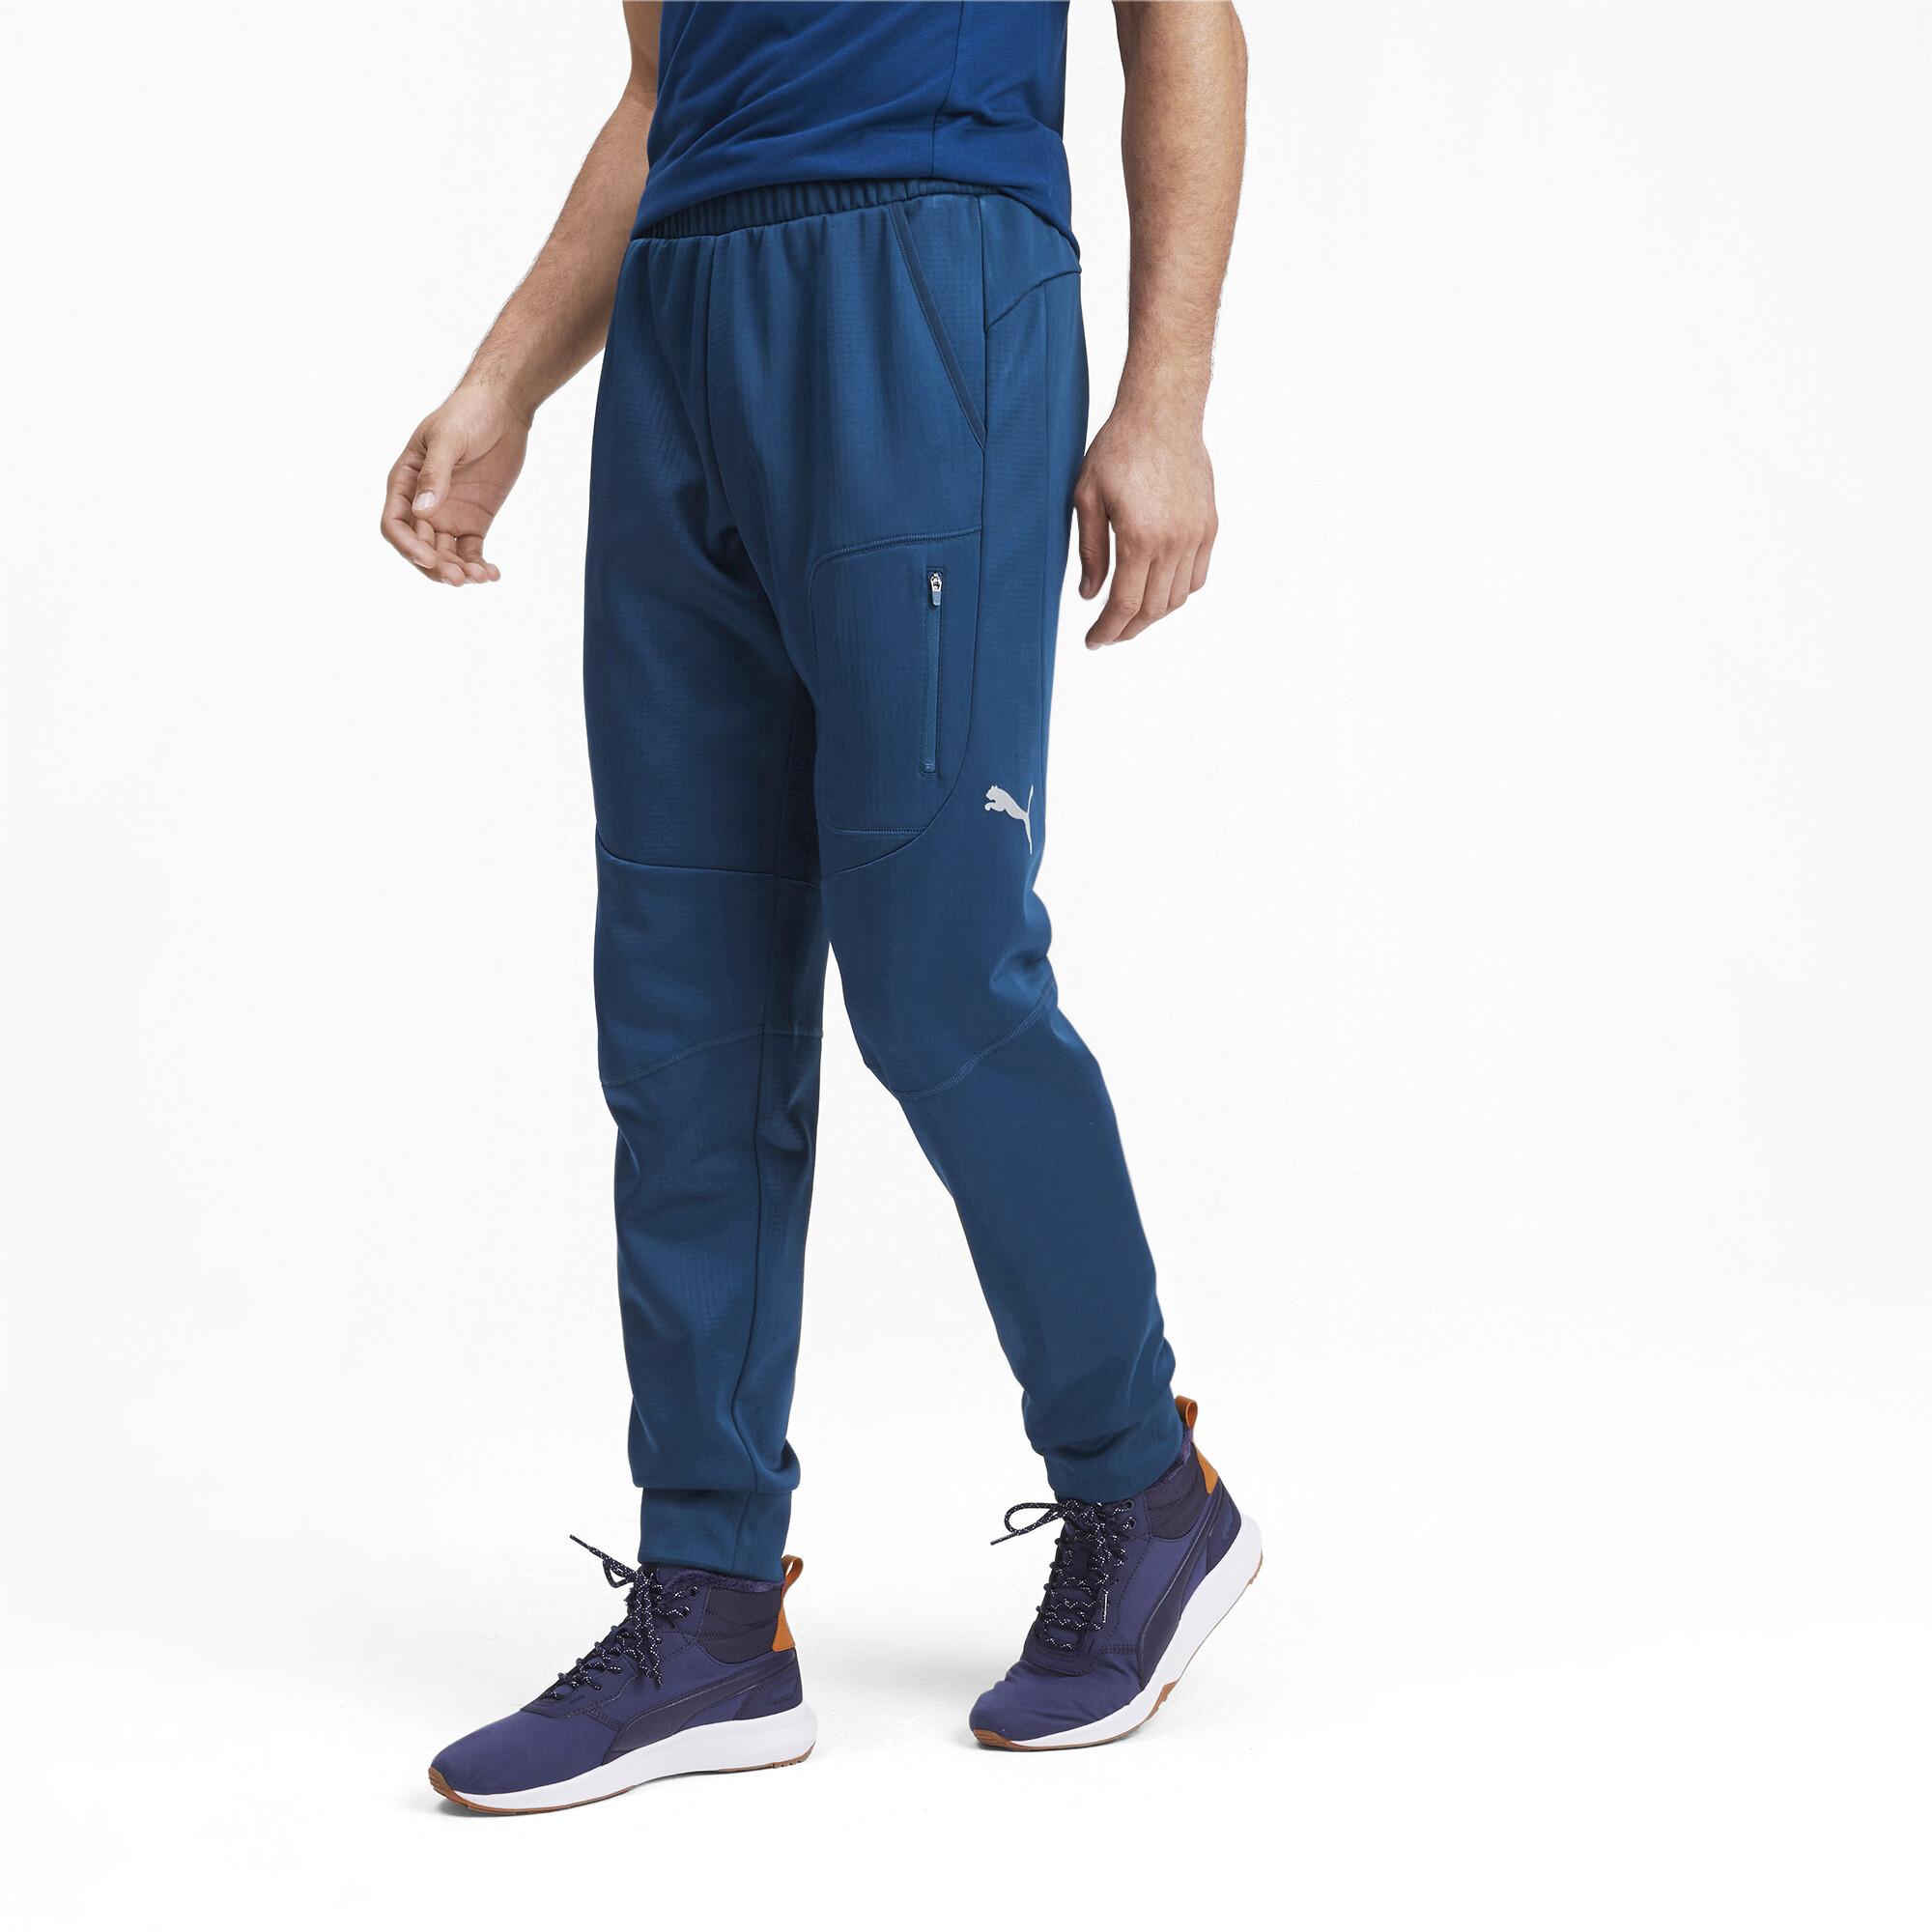 PUMA-Evostripe-Warm-Men-039-s-Pants-Men-Knitted-Pants-Basics miniatura 14